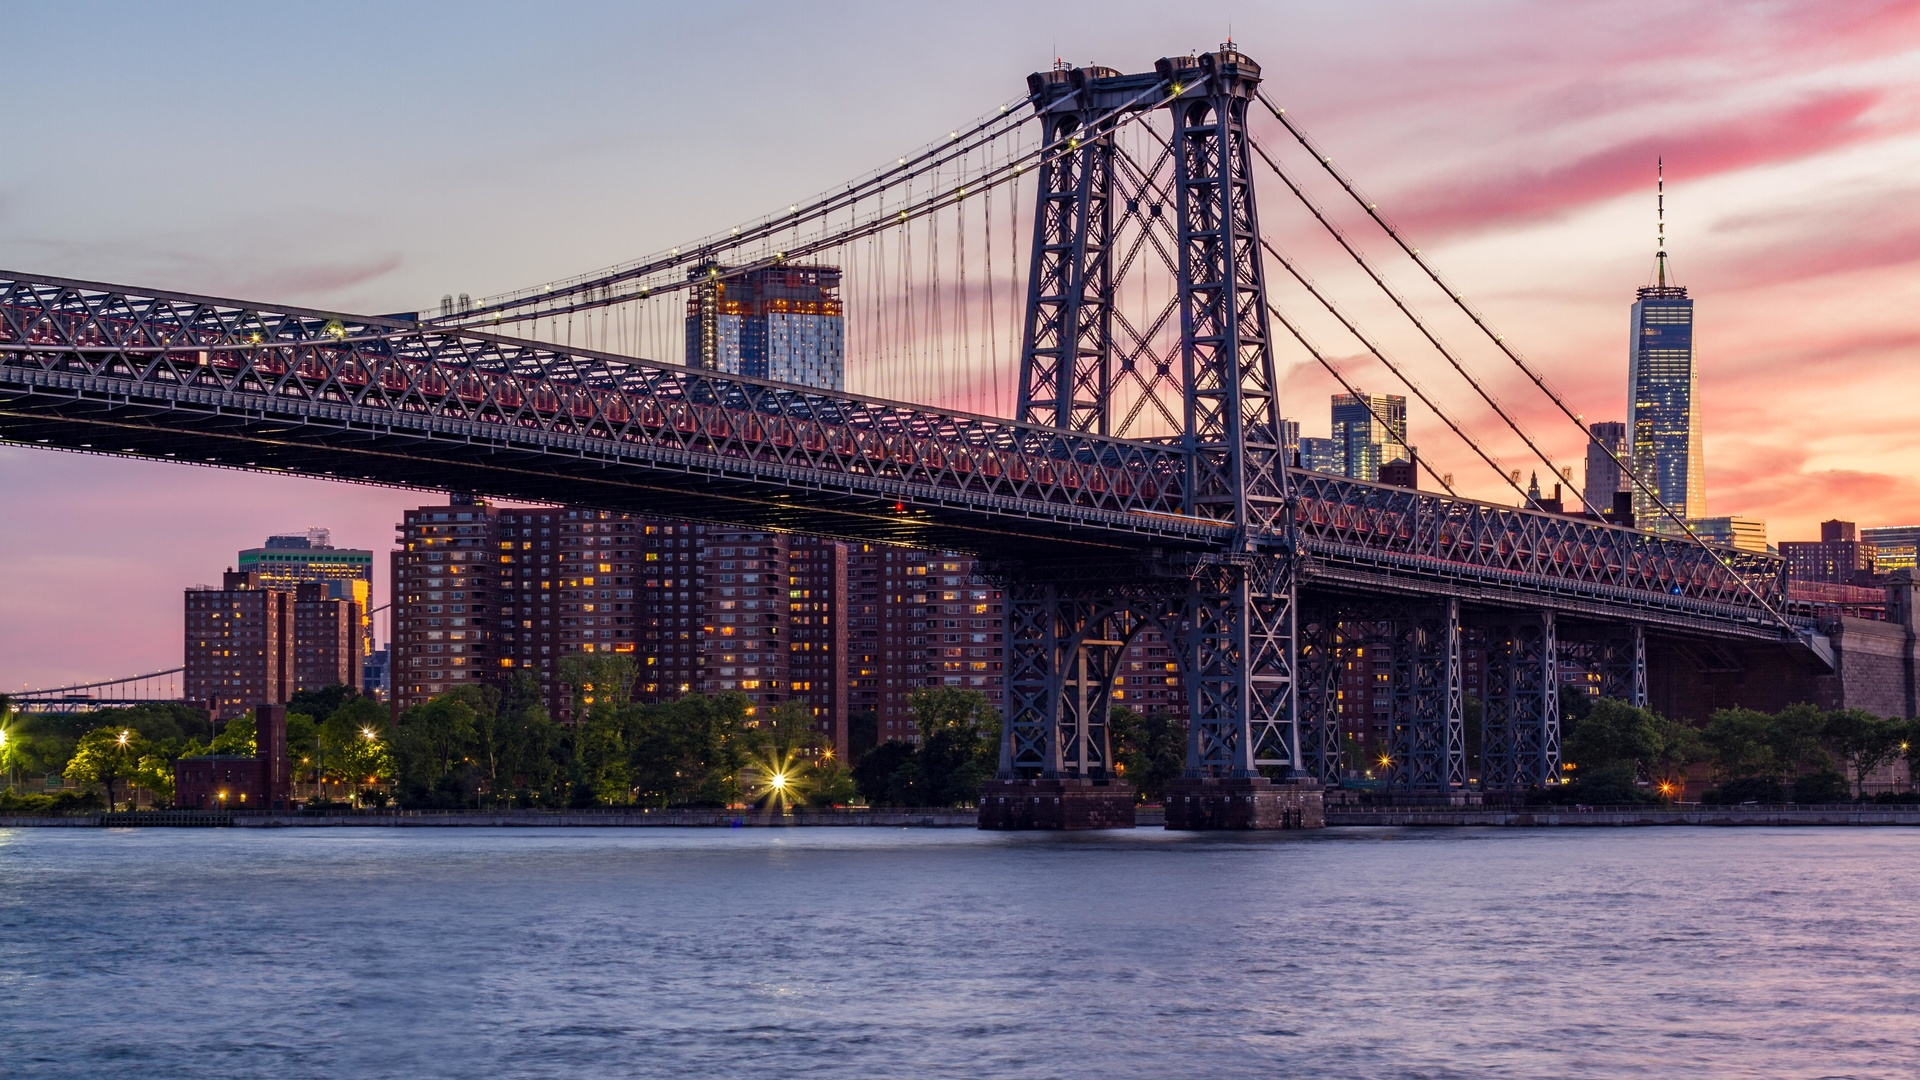 мост, архитектура, здания, город, вечер